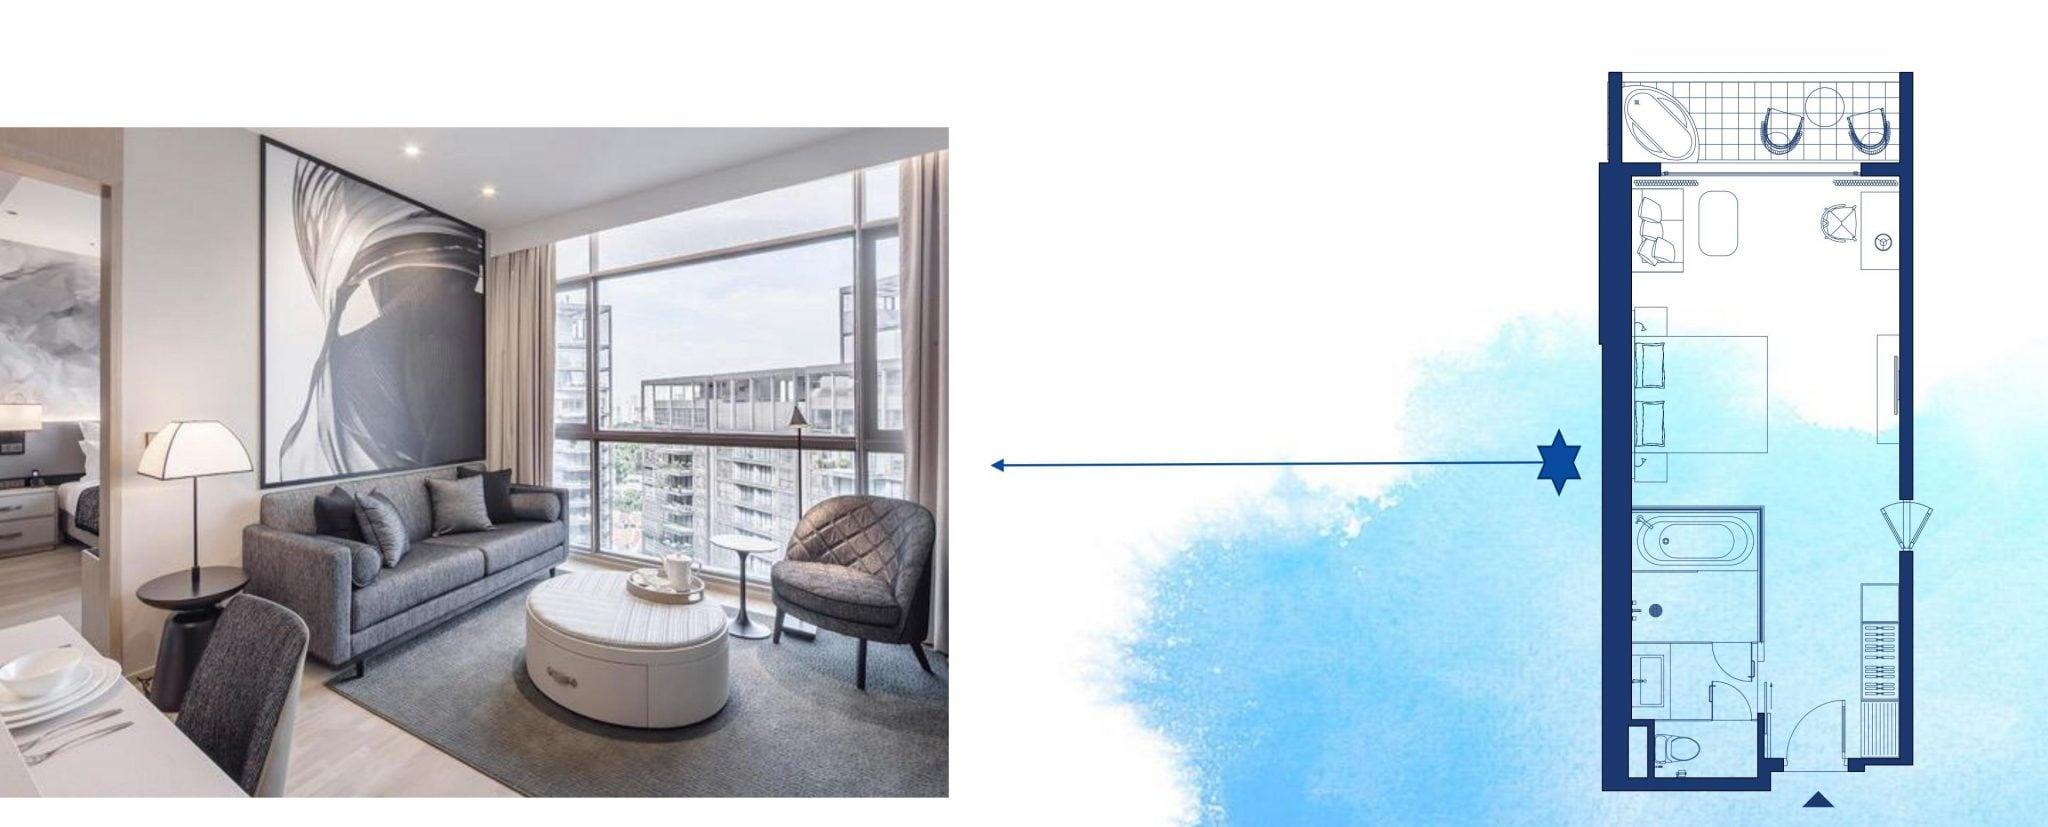 0041 e1563265218112 - Dự án căn hộ condotel Cam Ranh Bay - Pearl Cam Ranh